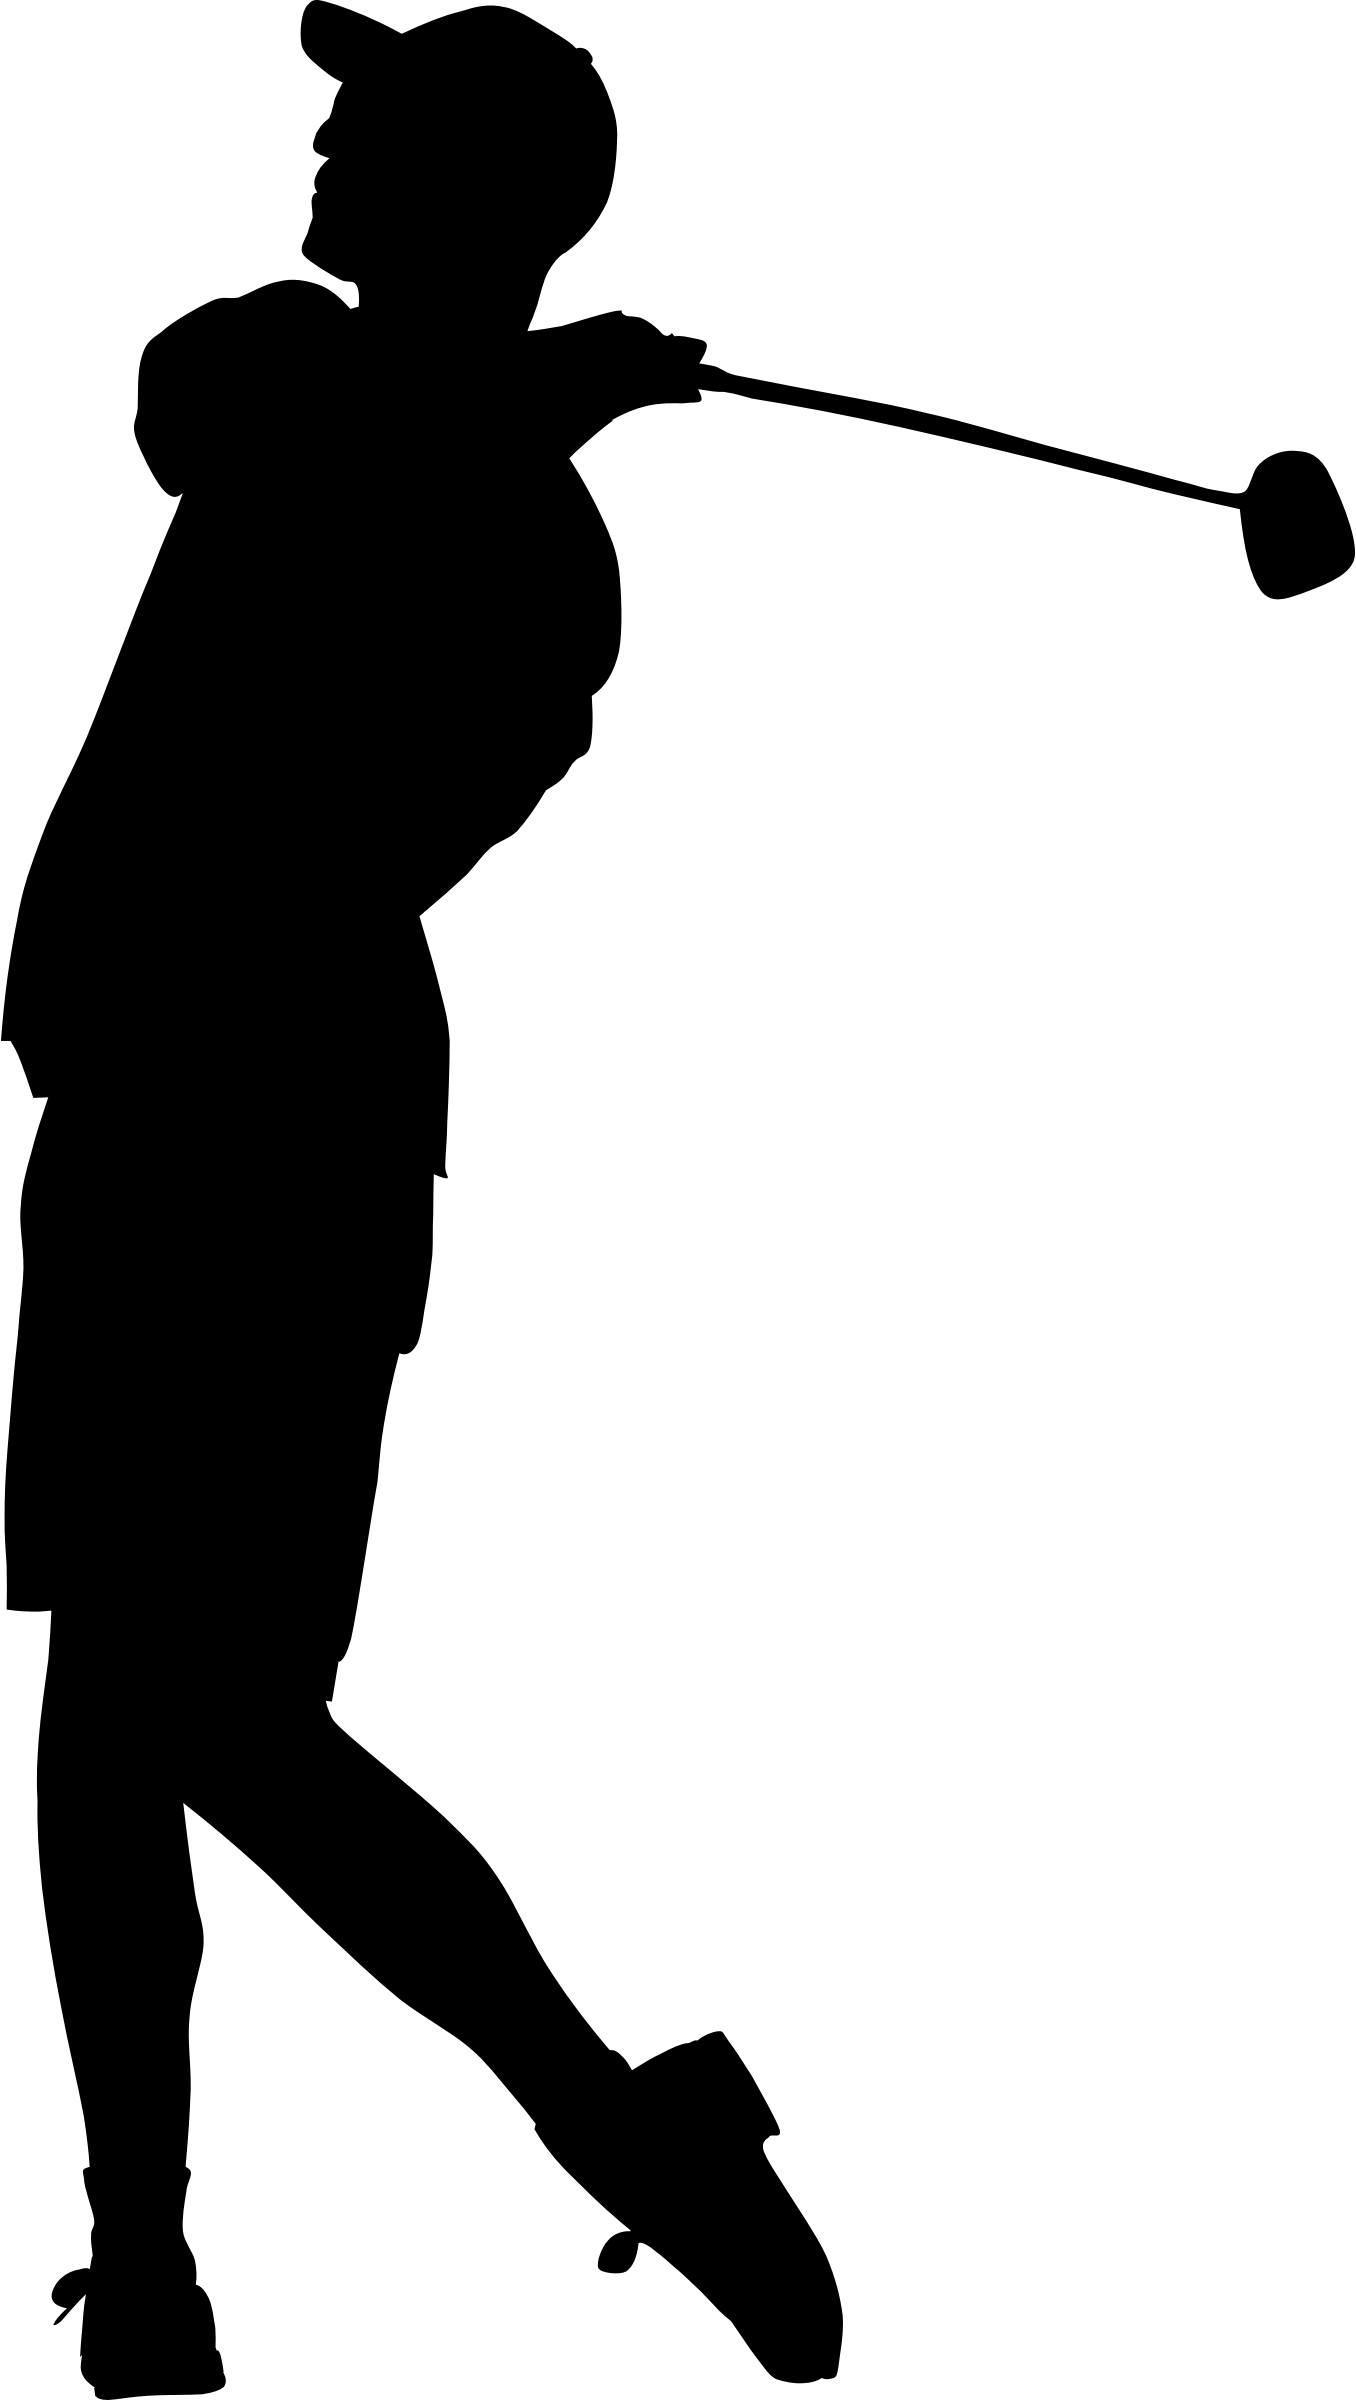 Clipart Golfer Silhouette